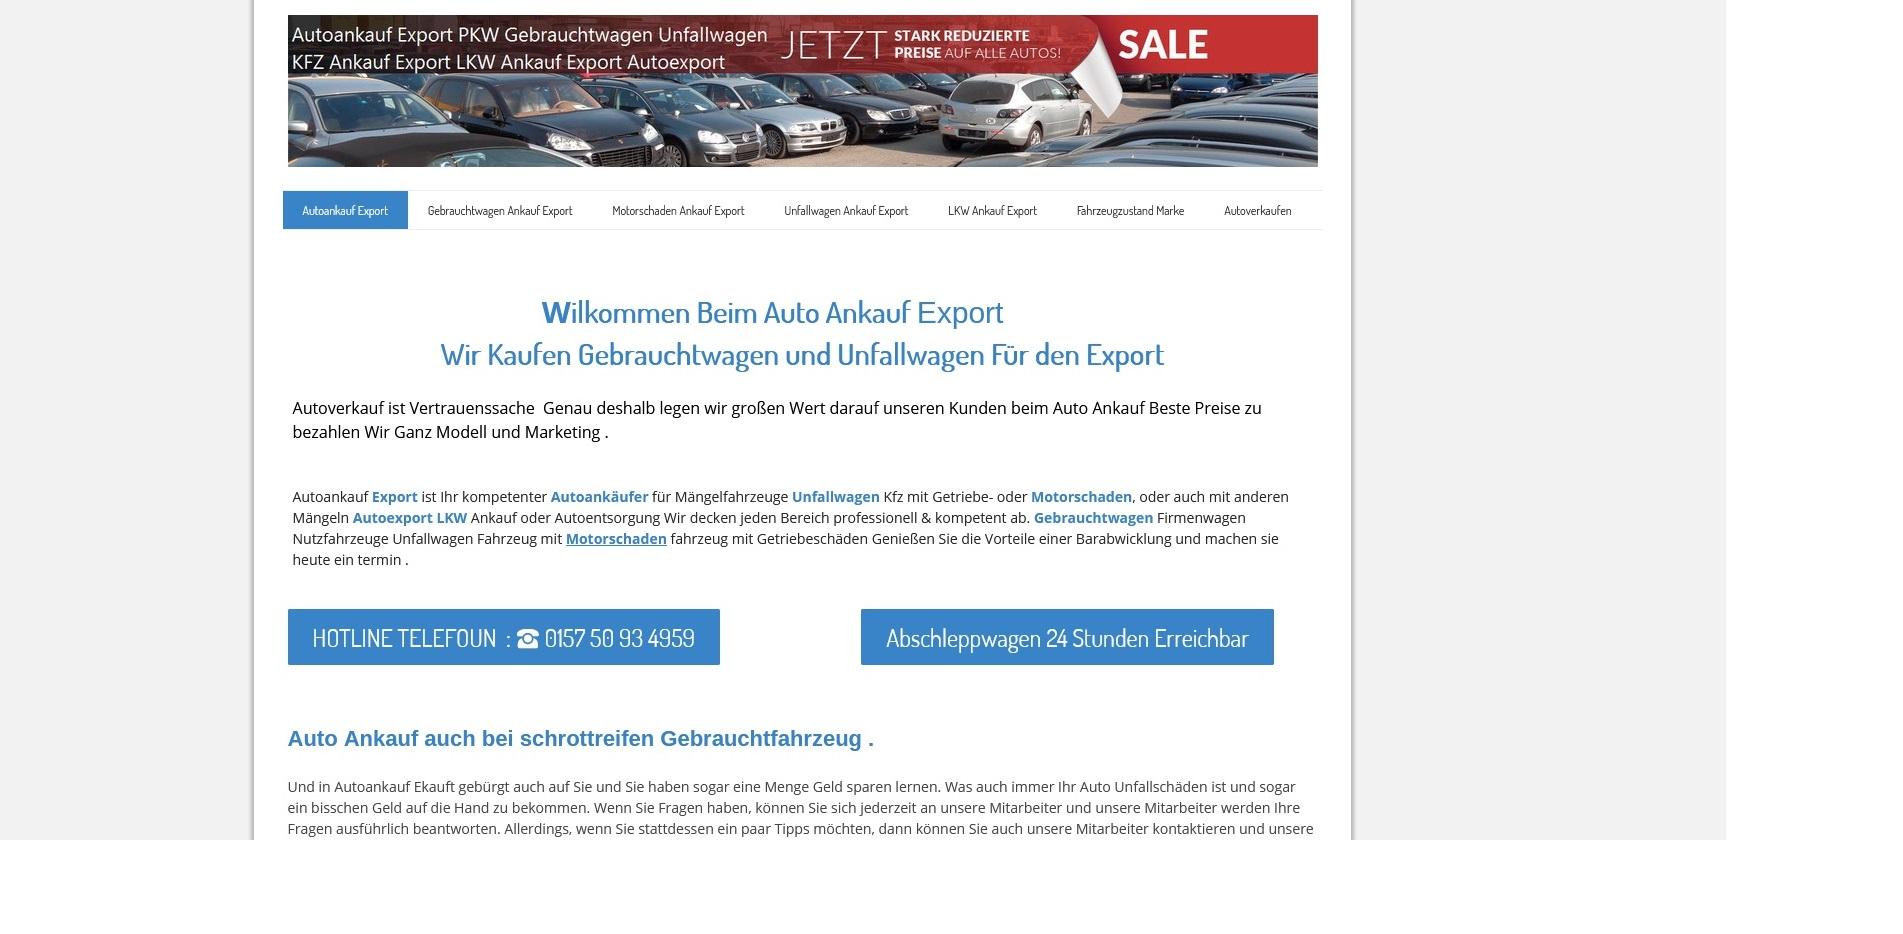 Kfz-Ankauf-export.de | Autoankauf Kassel | Autoankauf Export Kassel